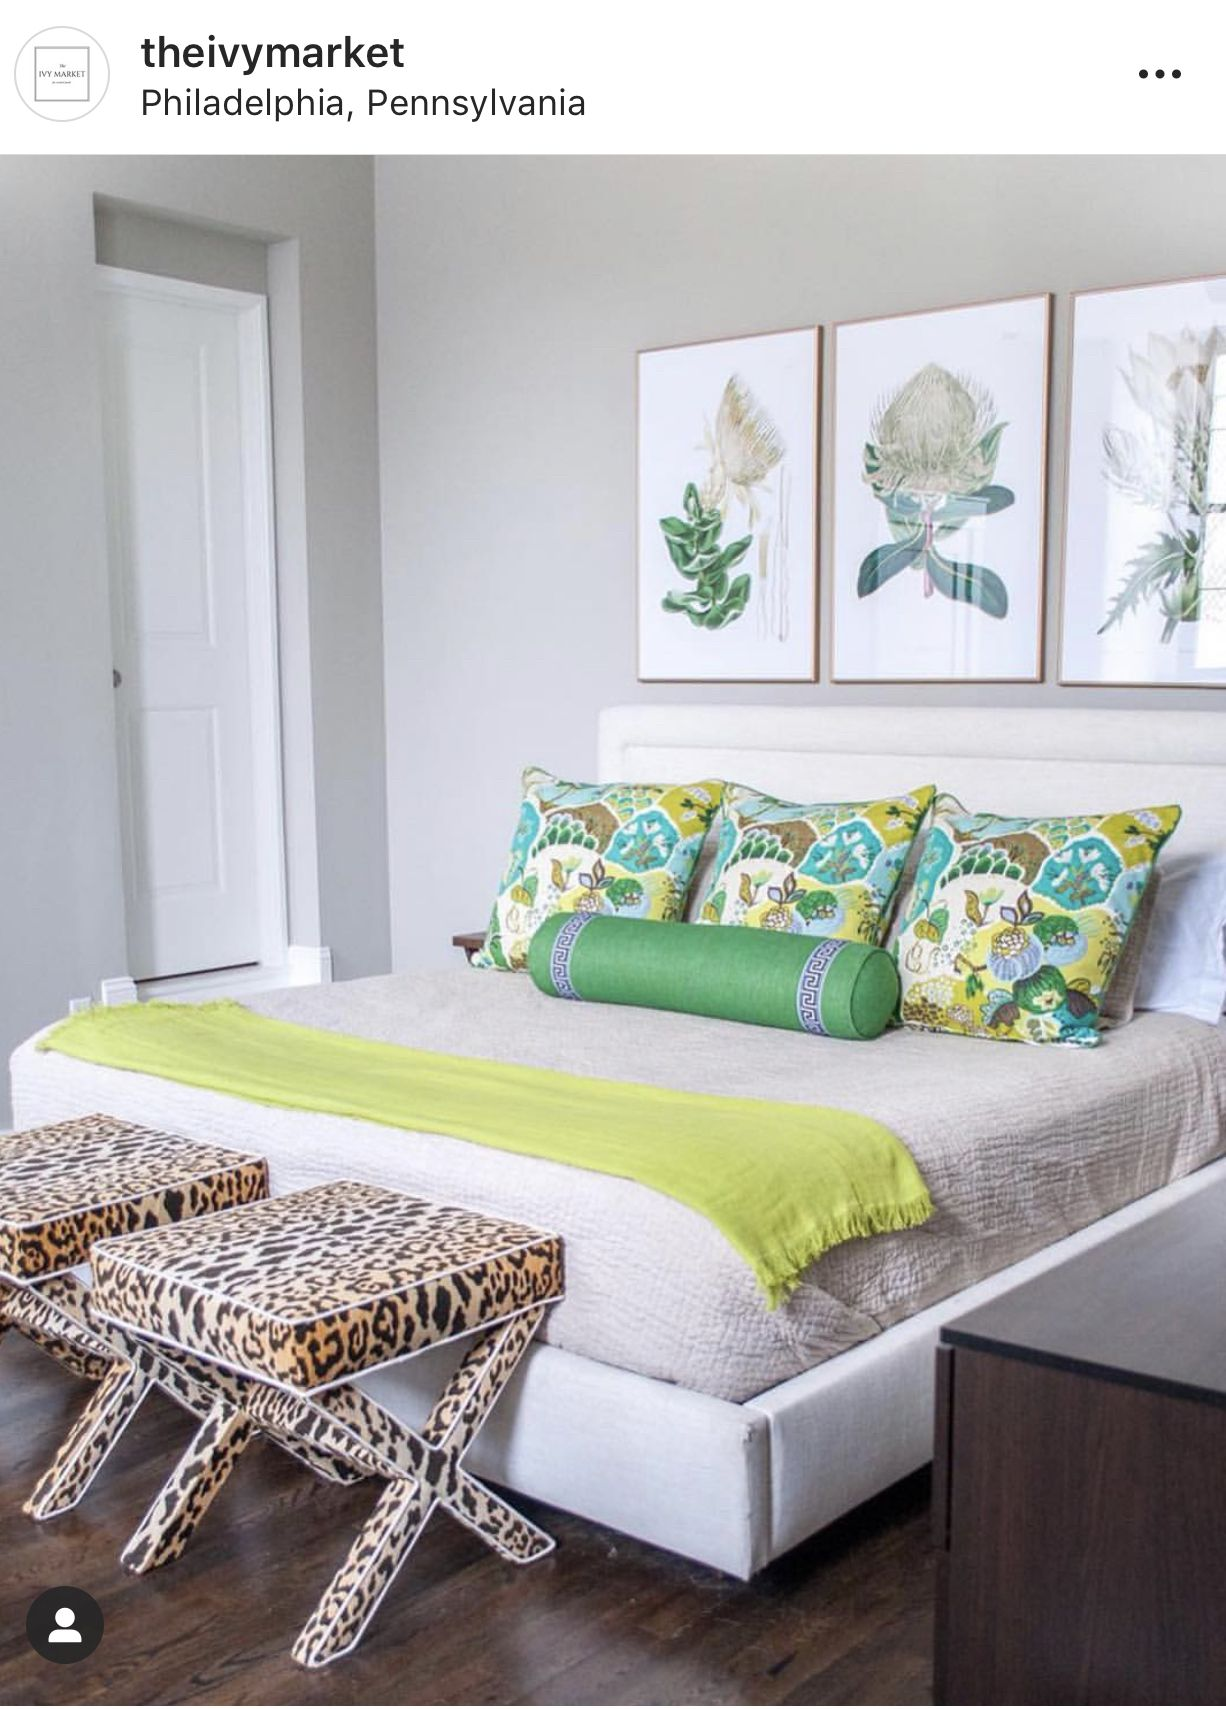 Custom Pillows And Bolster Pillow Loft Home Decor Home Decor Loft House Home